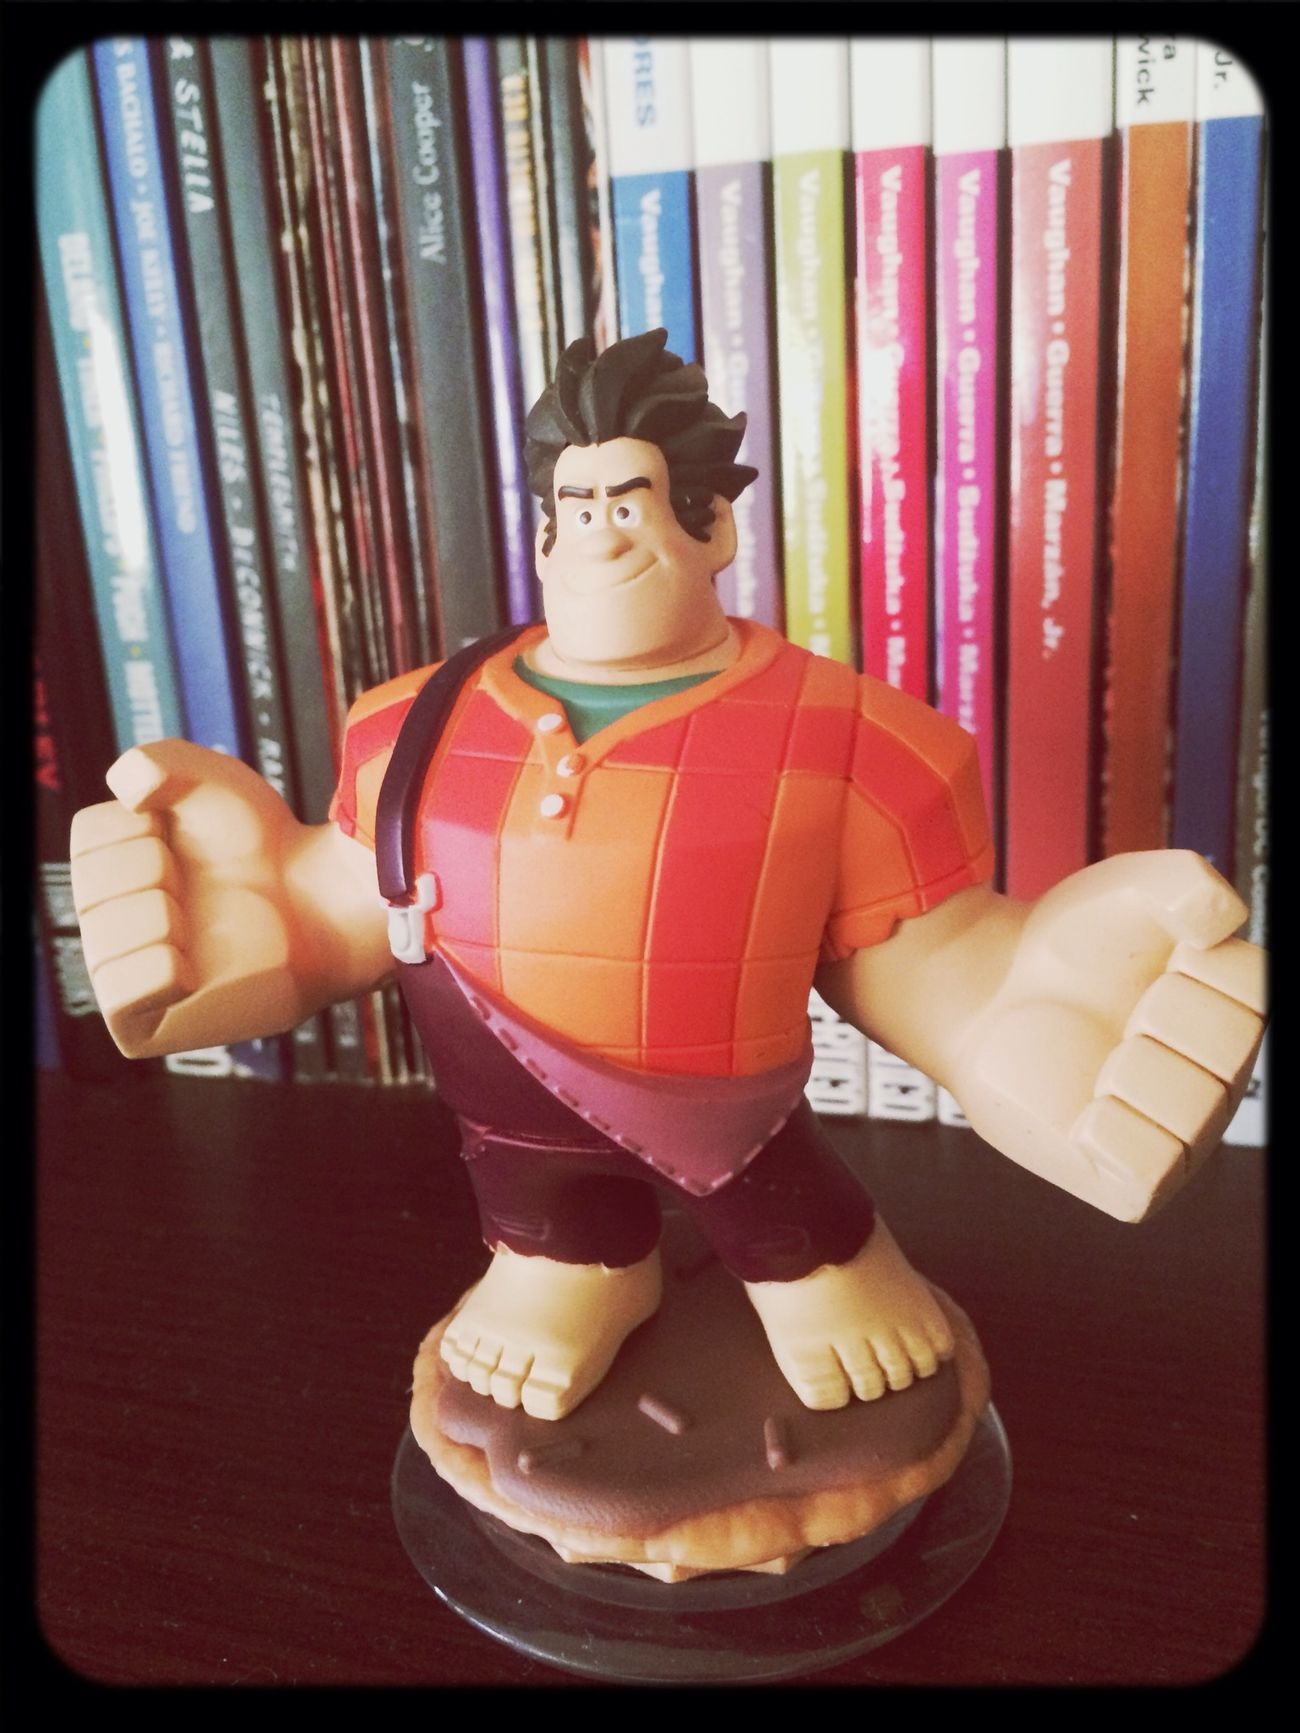 Ralf and my comic collection